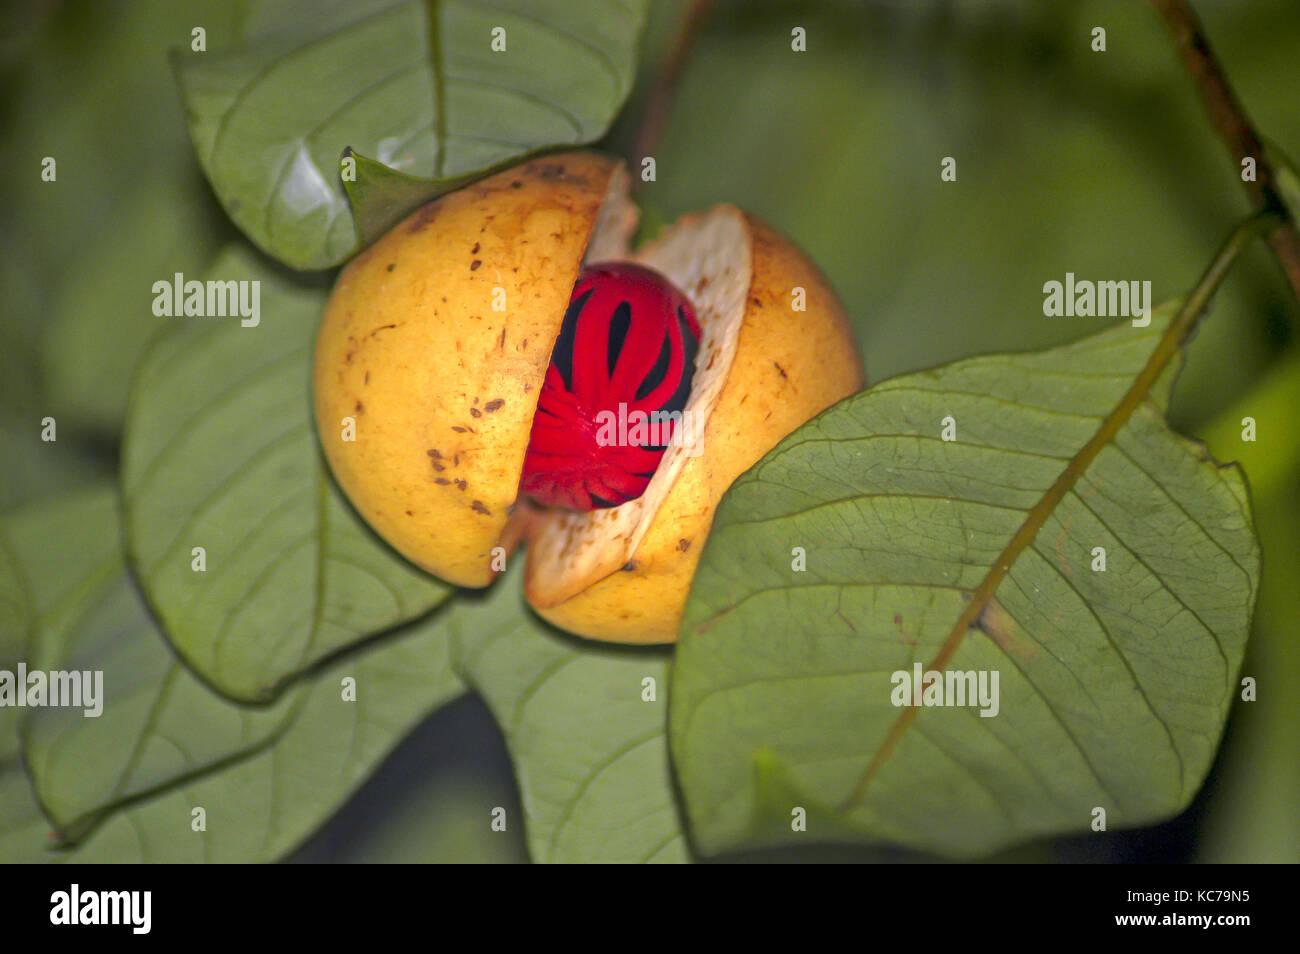 Detail ripe numeg on tree split open split open showing red mace covering the nut, Grenada - Stock Image